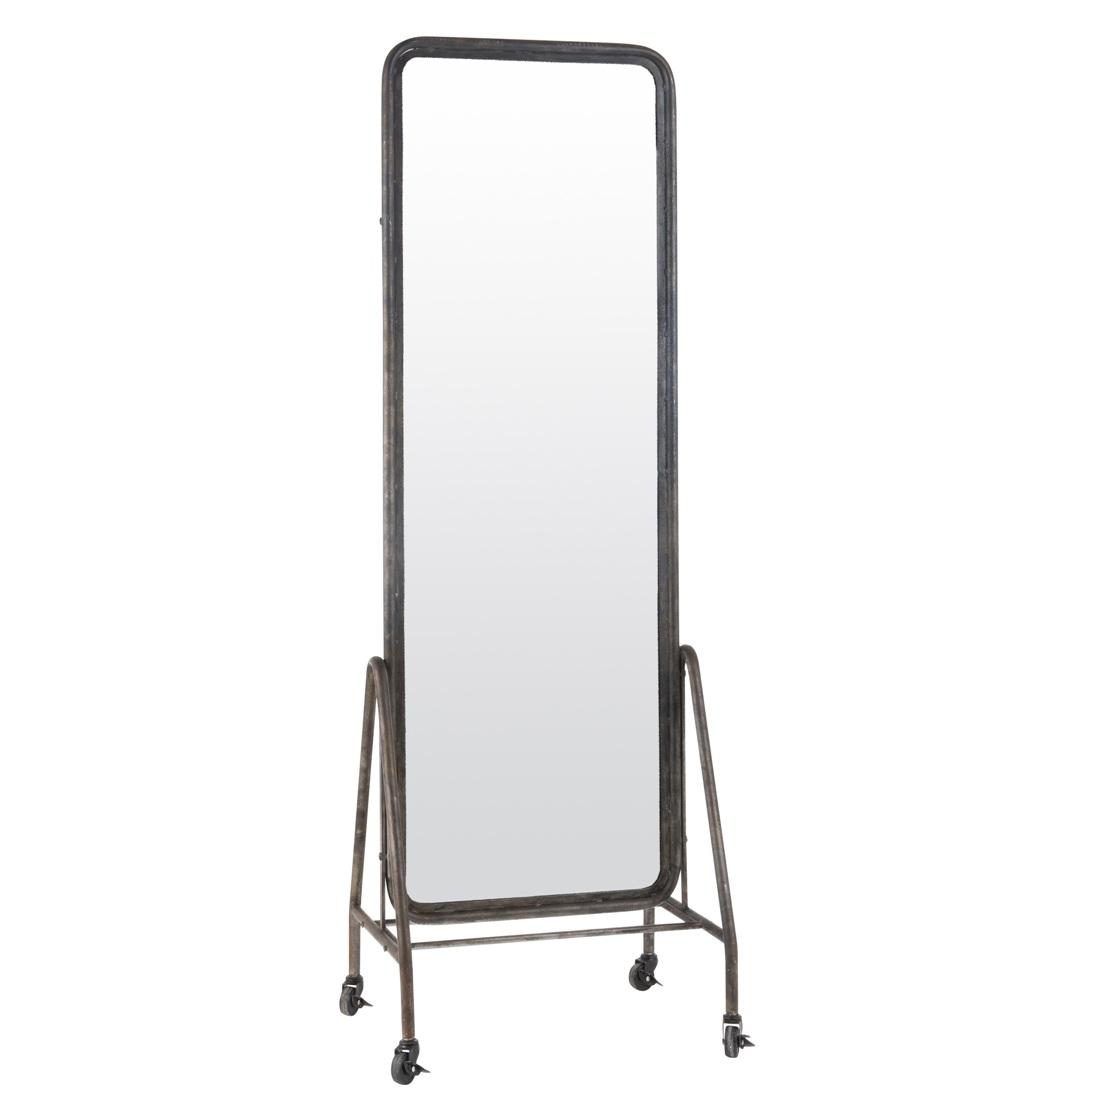 Black Inclined Free Standing Floor Mirror on Wheels by Ib Laursen 173 cm